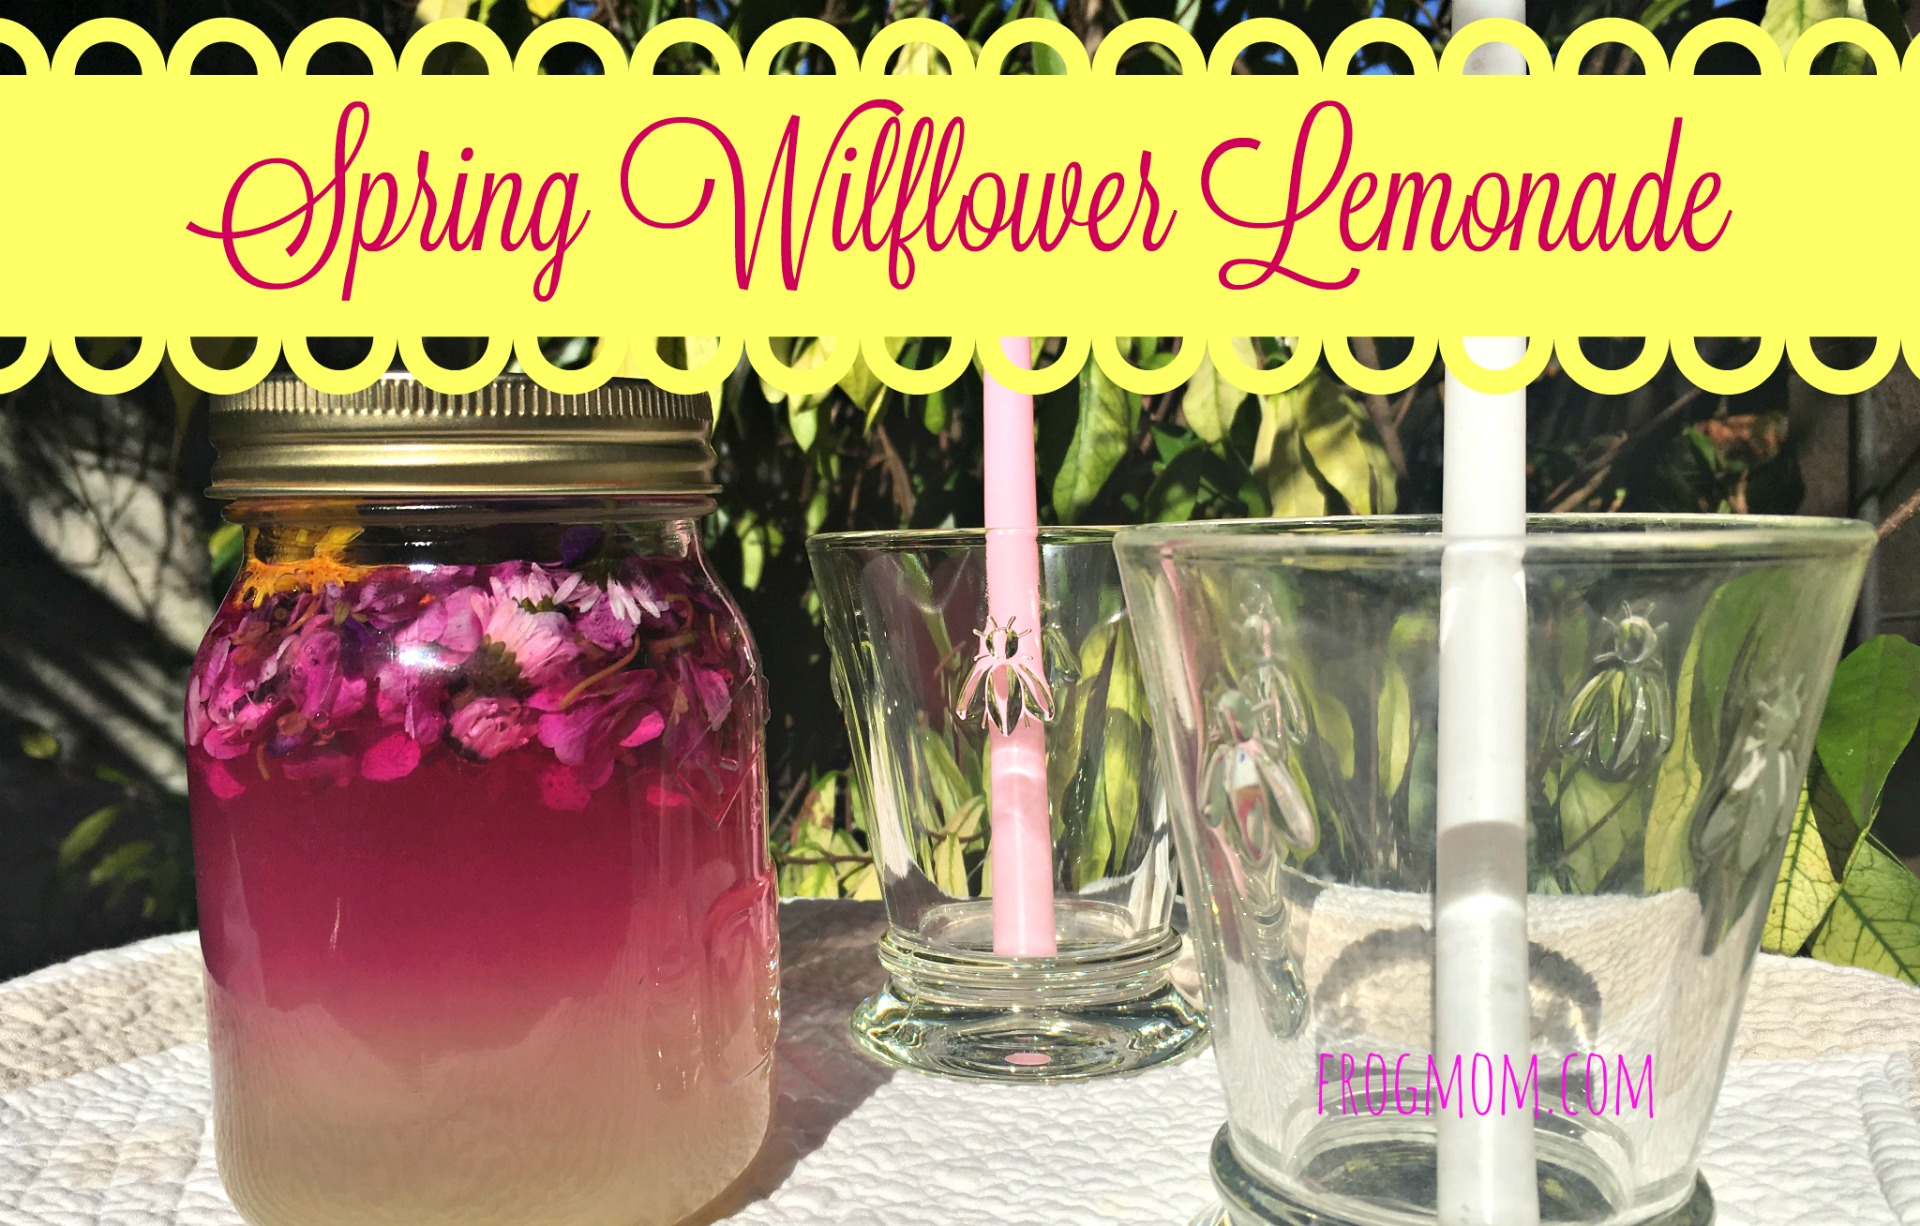 Spring Wildflower Lemonade Recipe